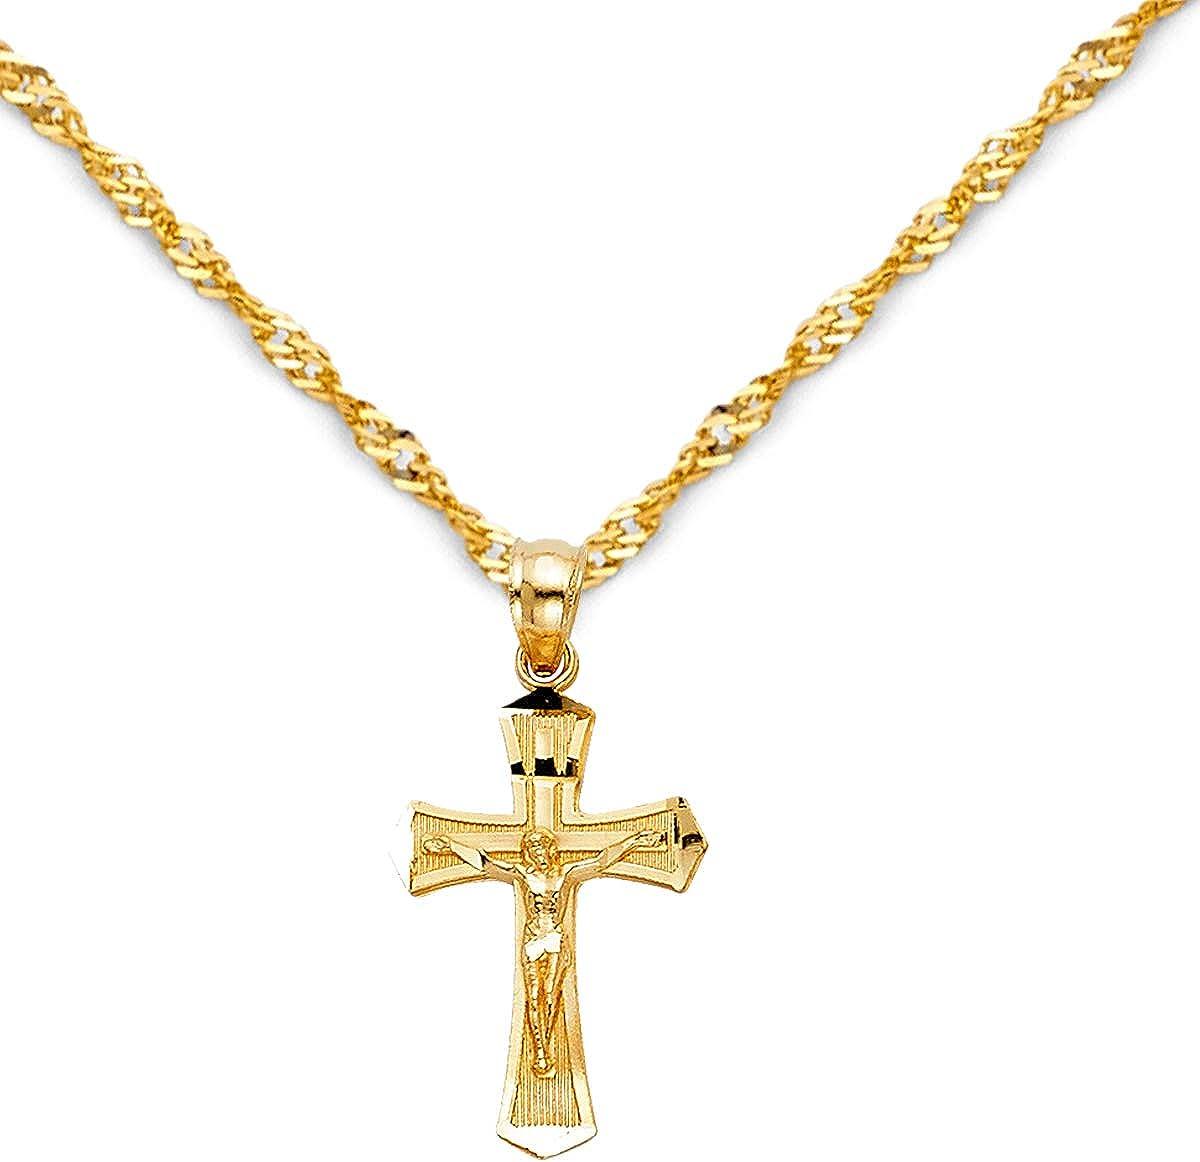 TGDJ 14k Yellow Gold Jesus Cross Religious Pendant with 1.2mm Singapore Chain Necklace